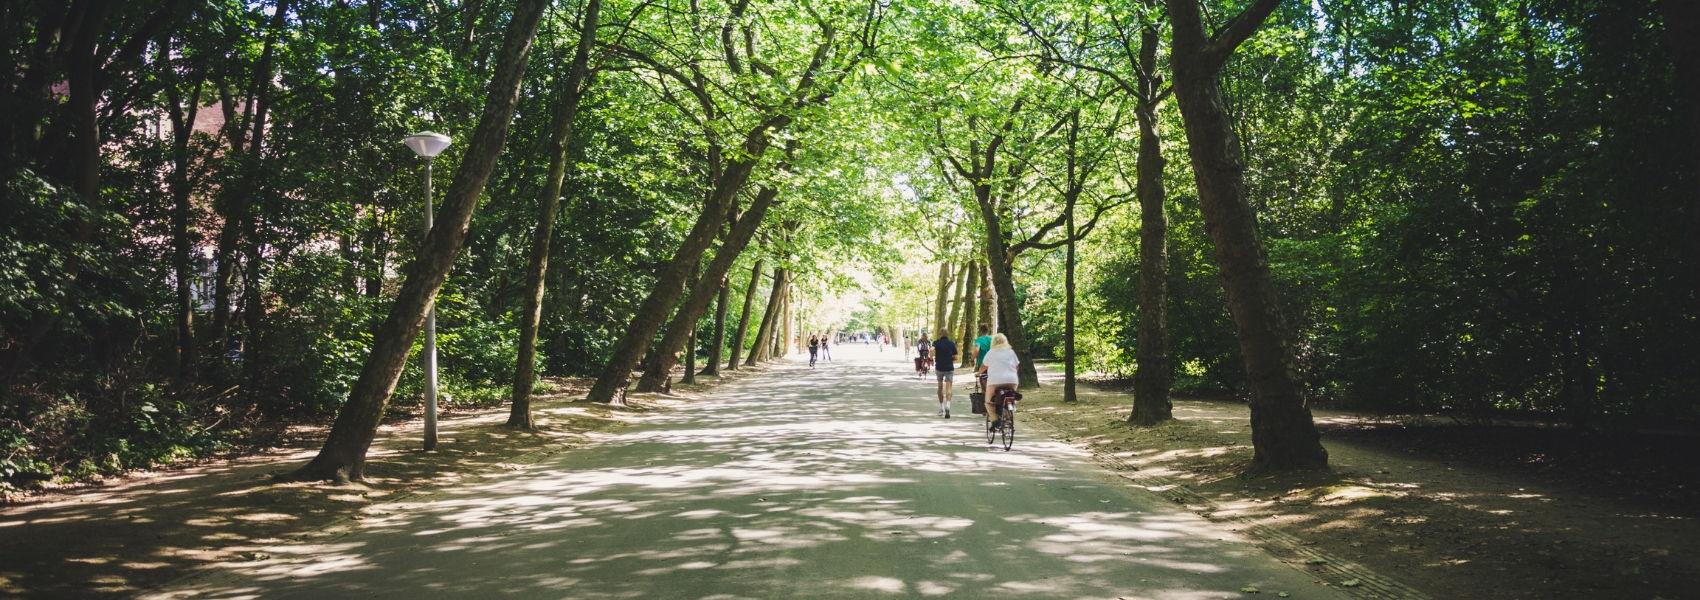 A receita para a felicidade pode estar num parque urbano